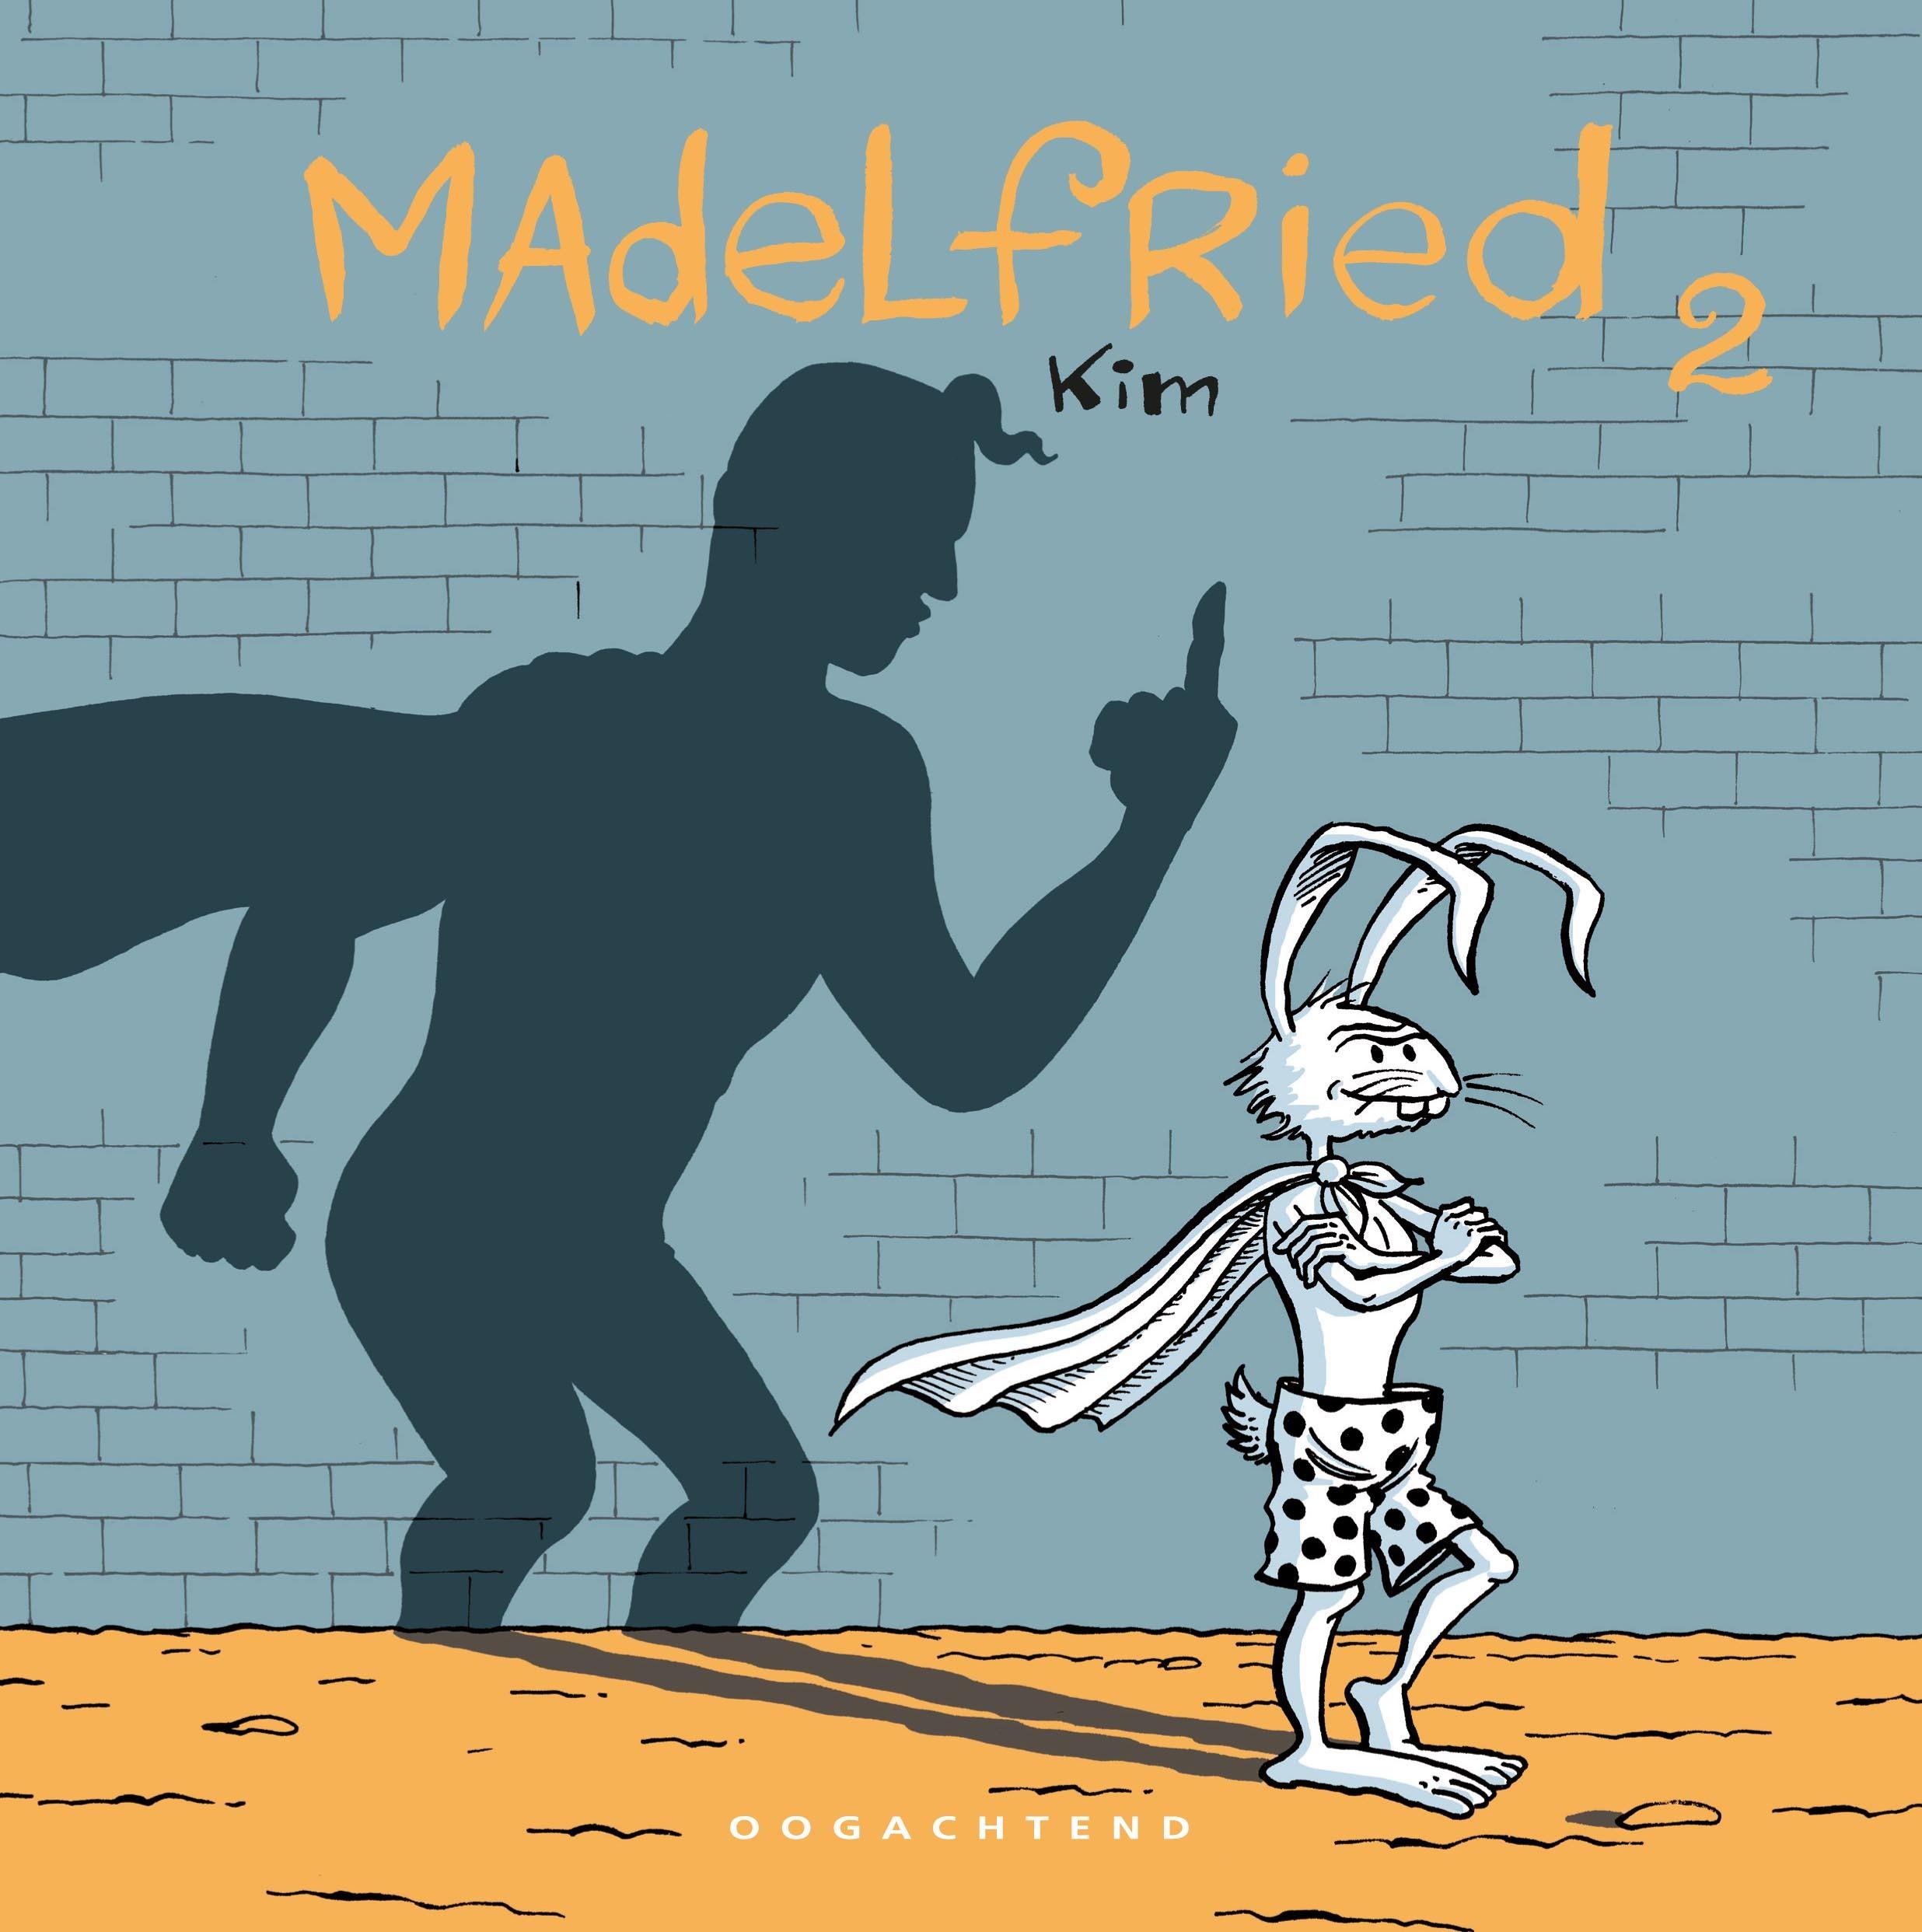 MADELFRIED 2